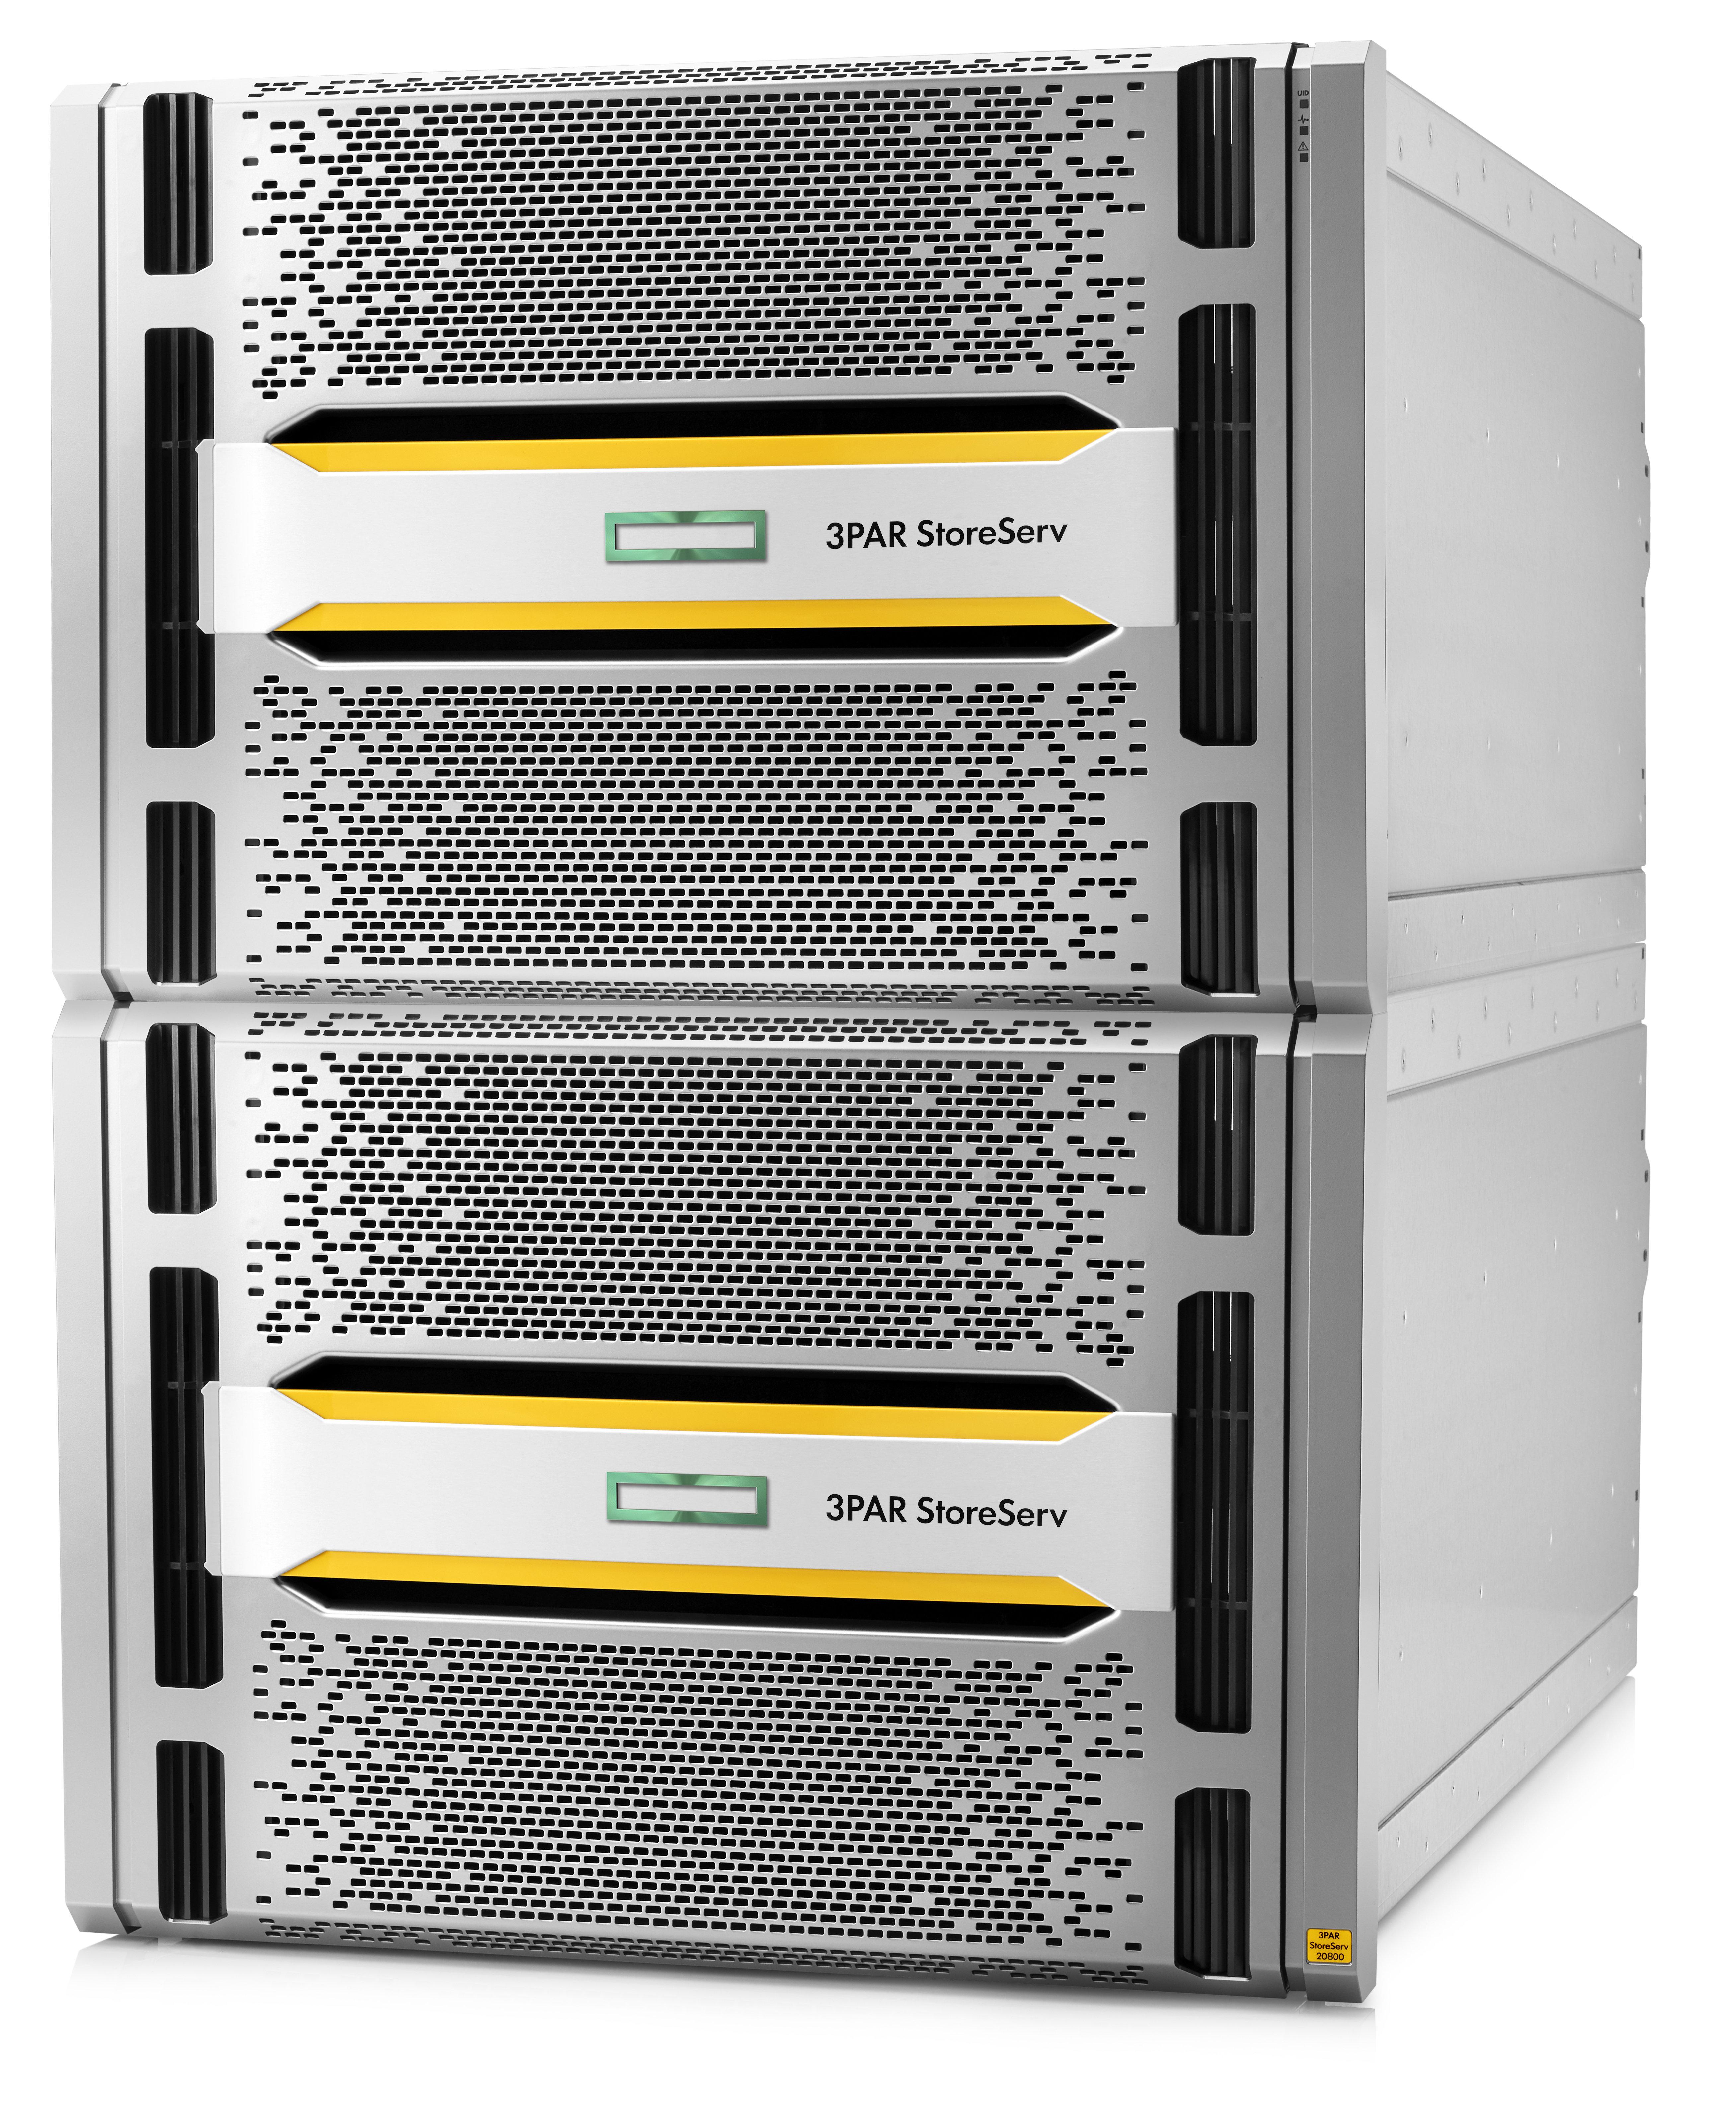 HPE 3PAR StoreServ 20800 Controller Node | Product Details